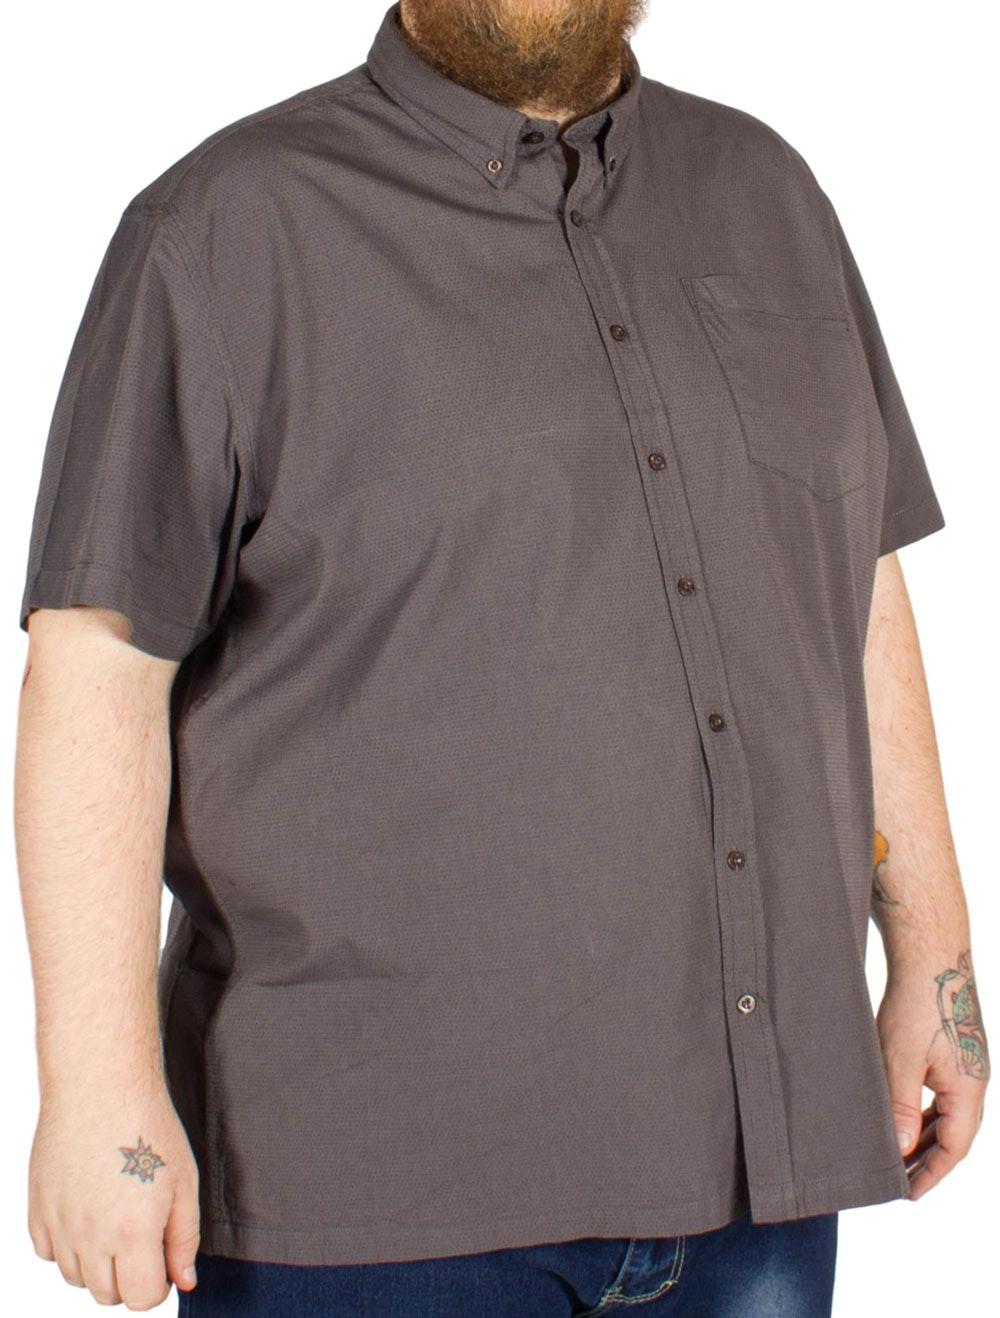 Bigdude Dot Pattern Short Sleeve Shirt Charcoal